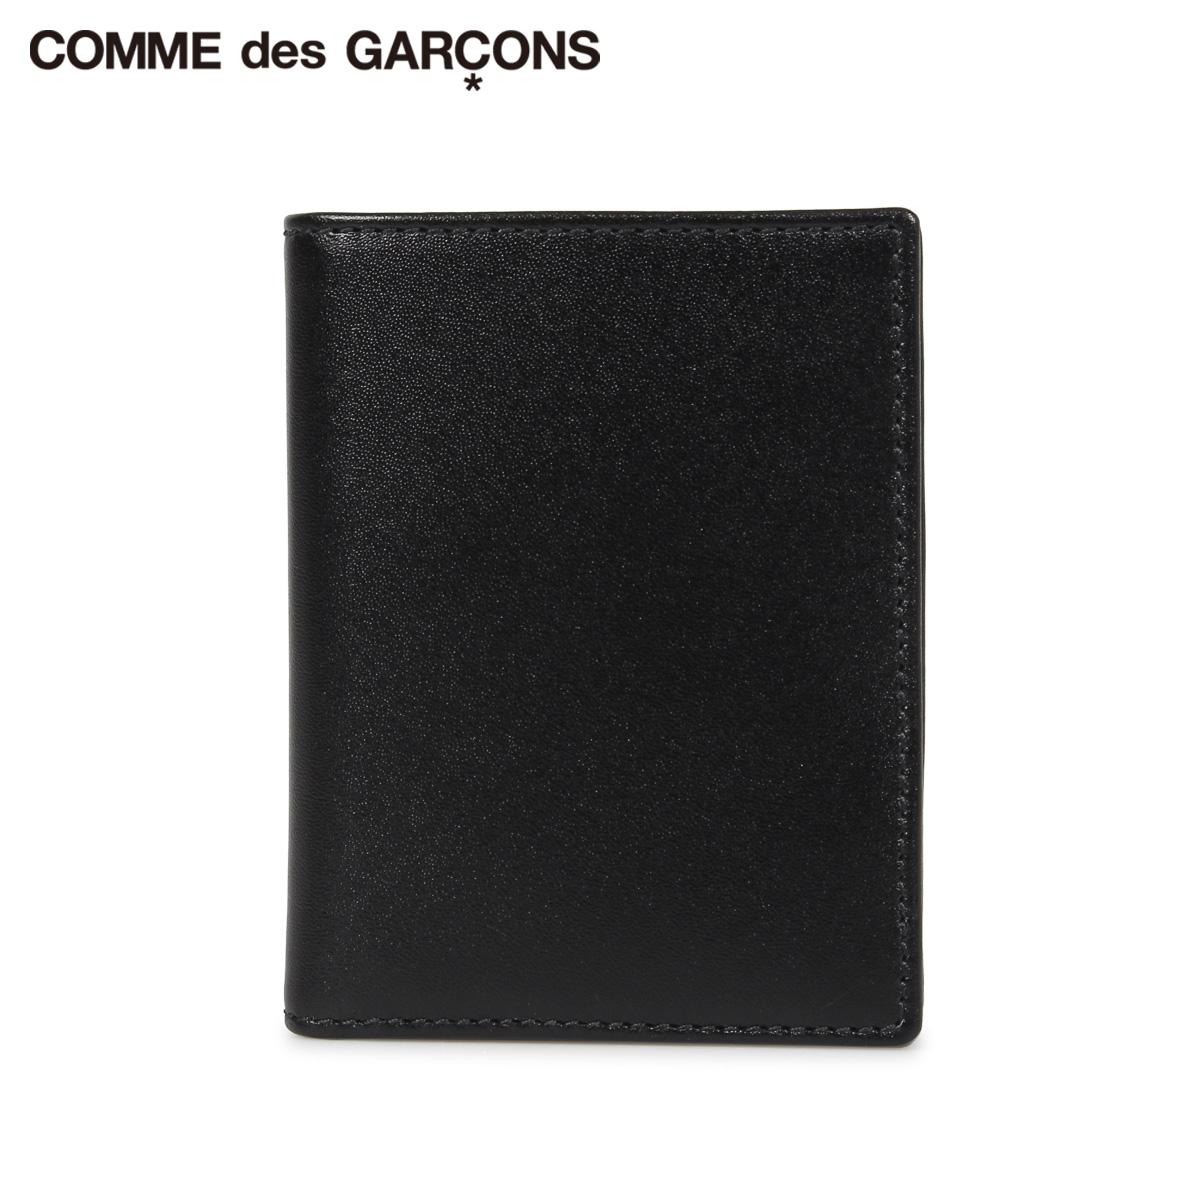 COMME des GARCONS CLASSIC WALLET コムデギャルソン 財布 二つ折り メンズ レディース 本革 ブラック 黒 SA0641